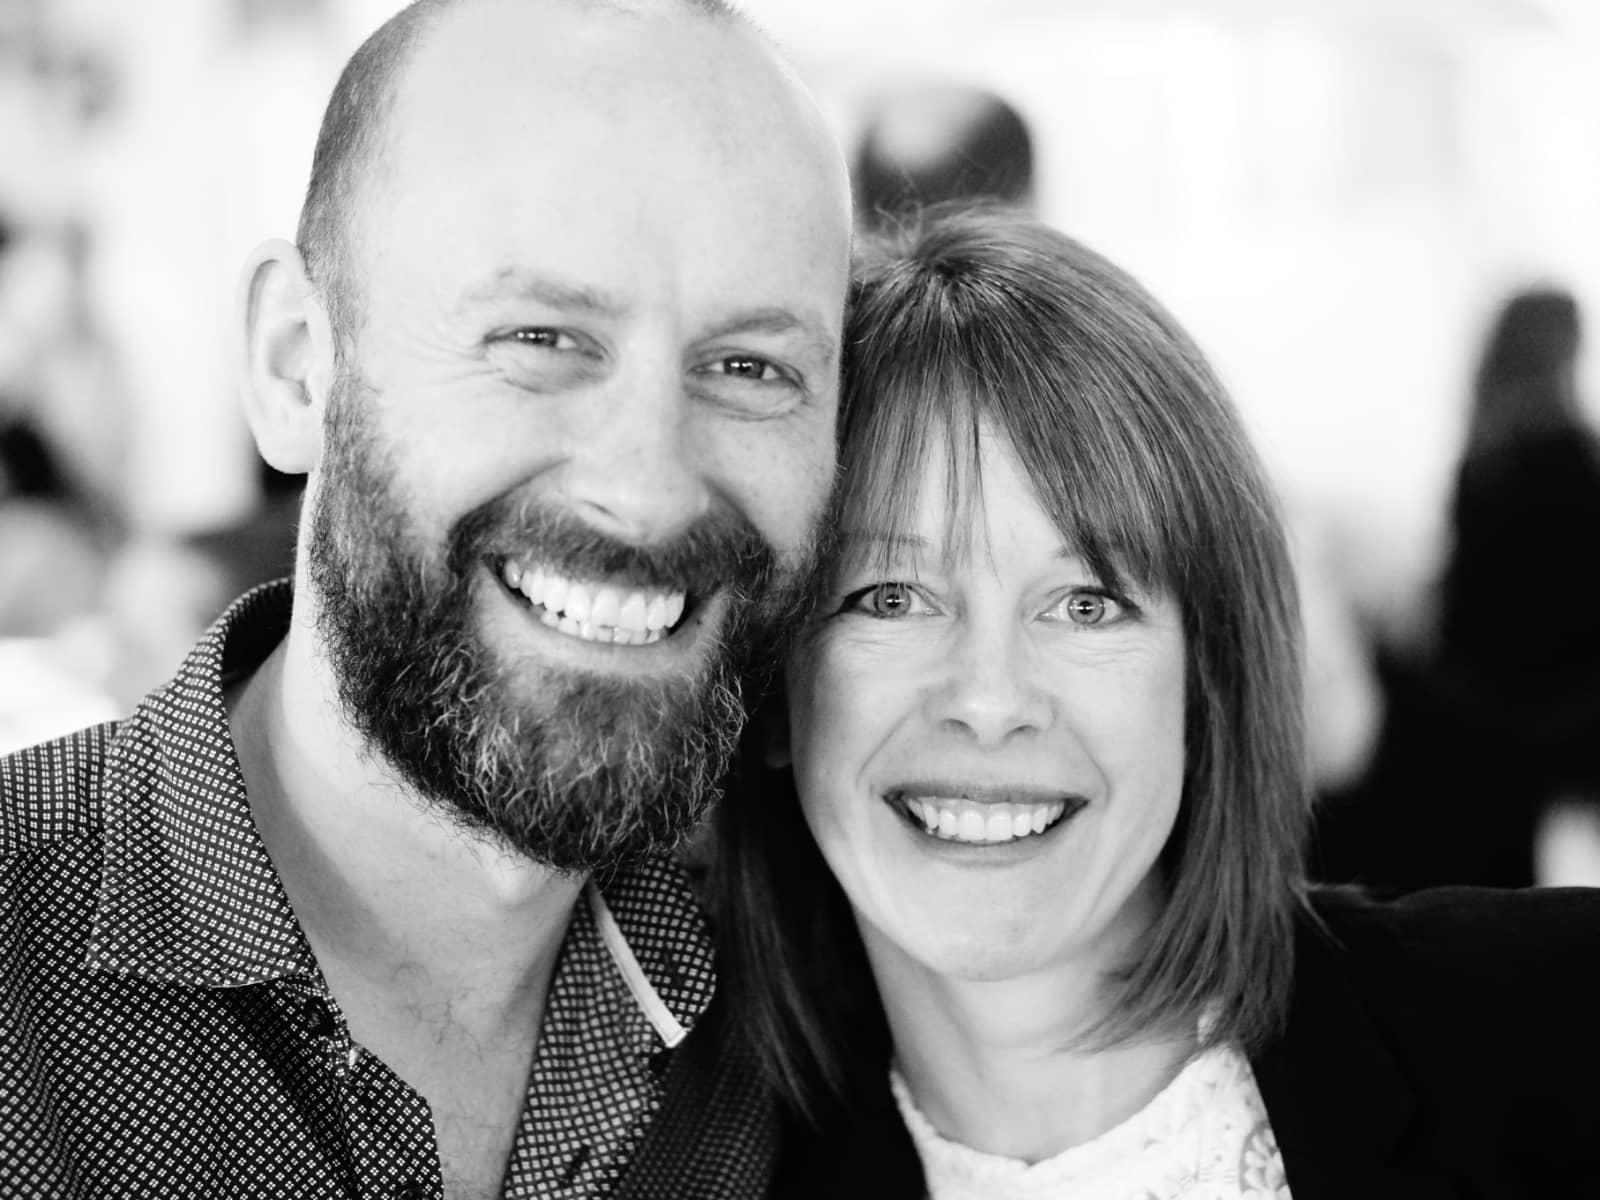 Phil & Lisa from Melbourne, Victoria, Australia